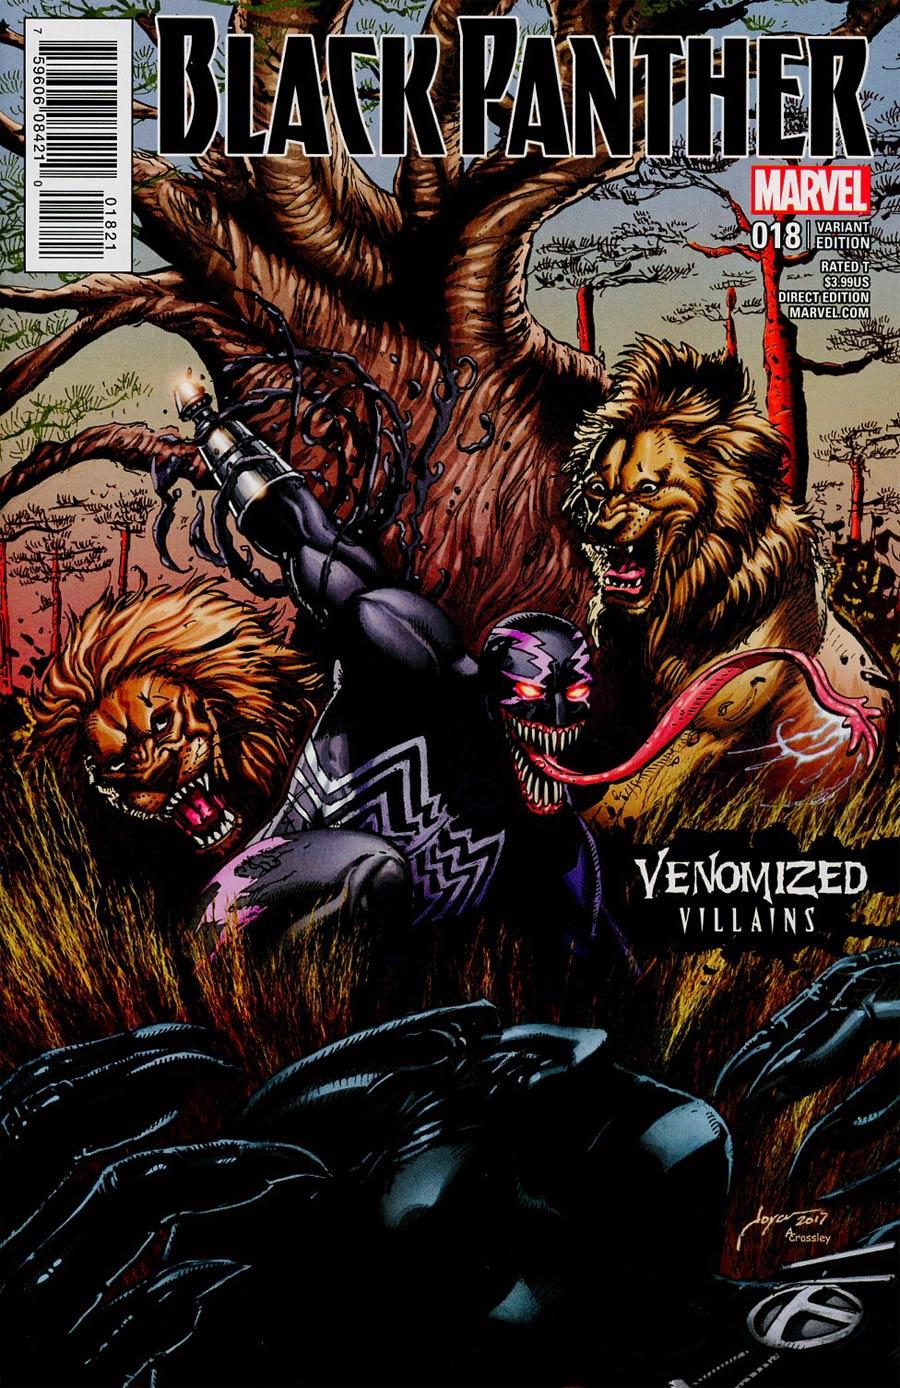 Black Panther Vol 6 #18 Cover C Variant Joyce Chin Venomized Klaw Cover